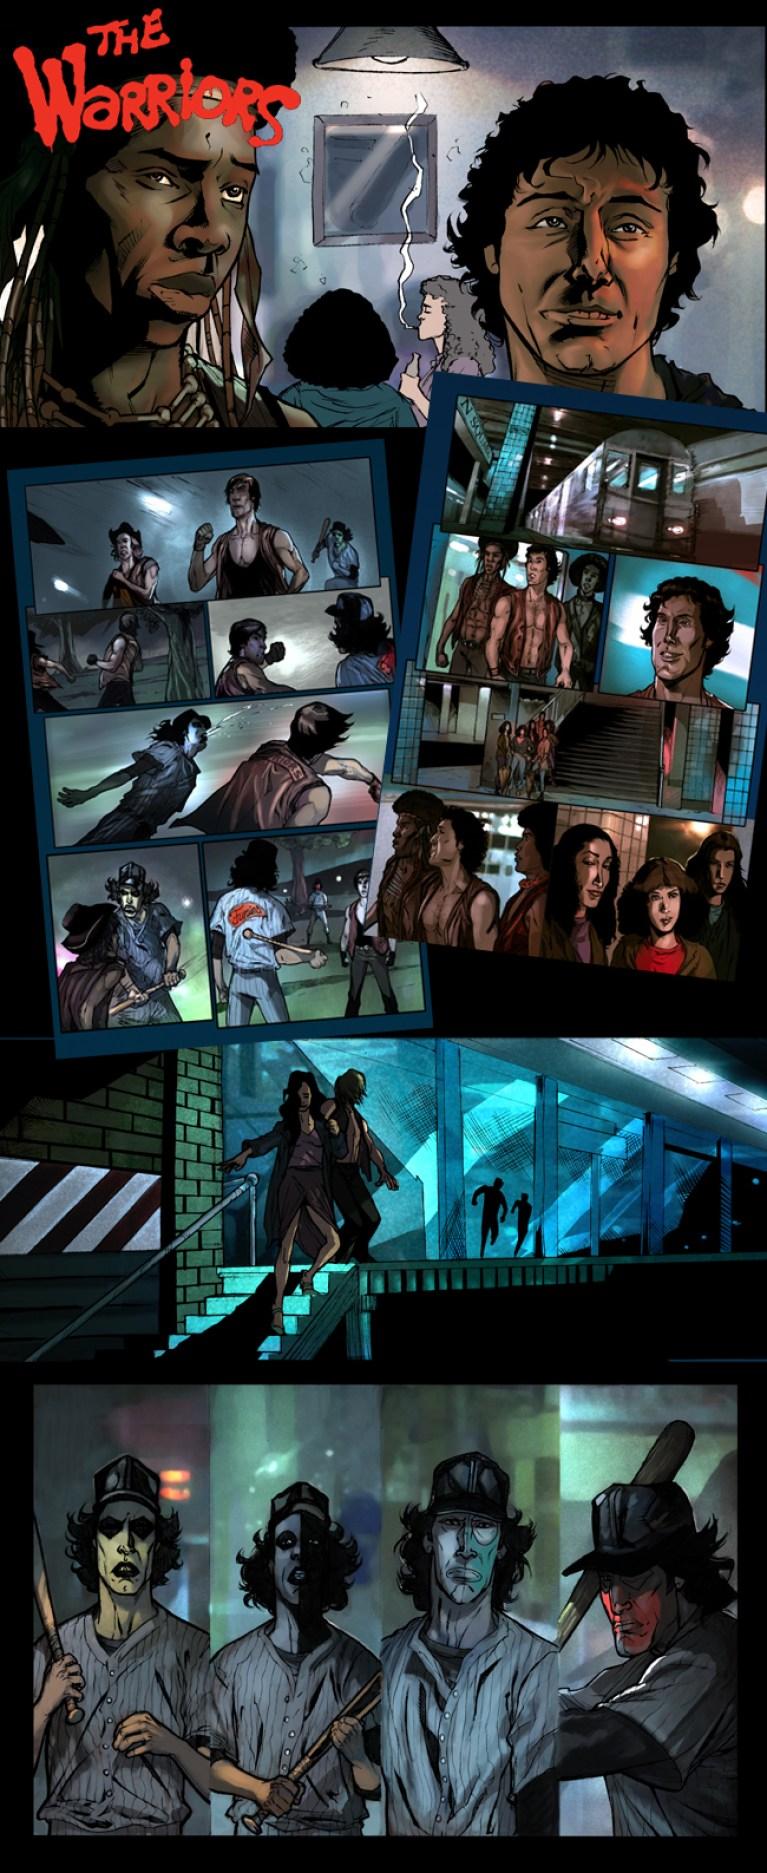 The Warriors 1 en Academia c10. Cursos de comic e ilustracion digital, aerografia, y manga. Madrid. Carlos Diez